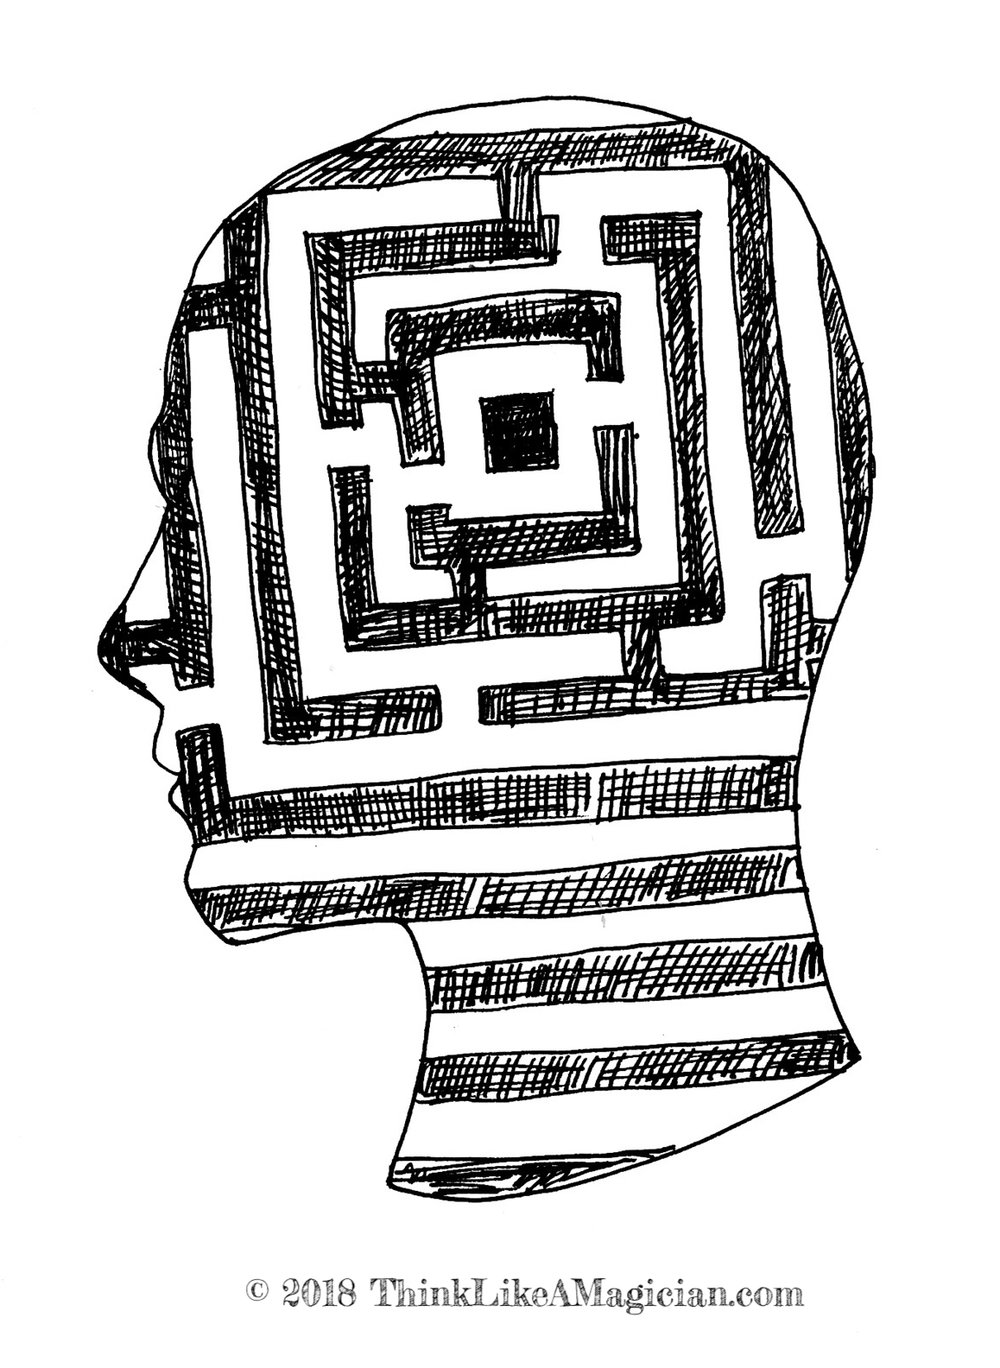 Think-Like-A-Magician-Keynote-Speaker-Kostya-Kimlat-Orlando-Image-Brain-Puzzle.jpg